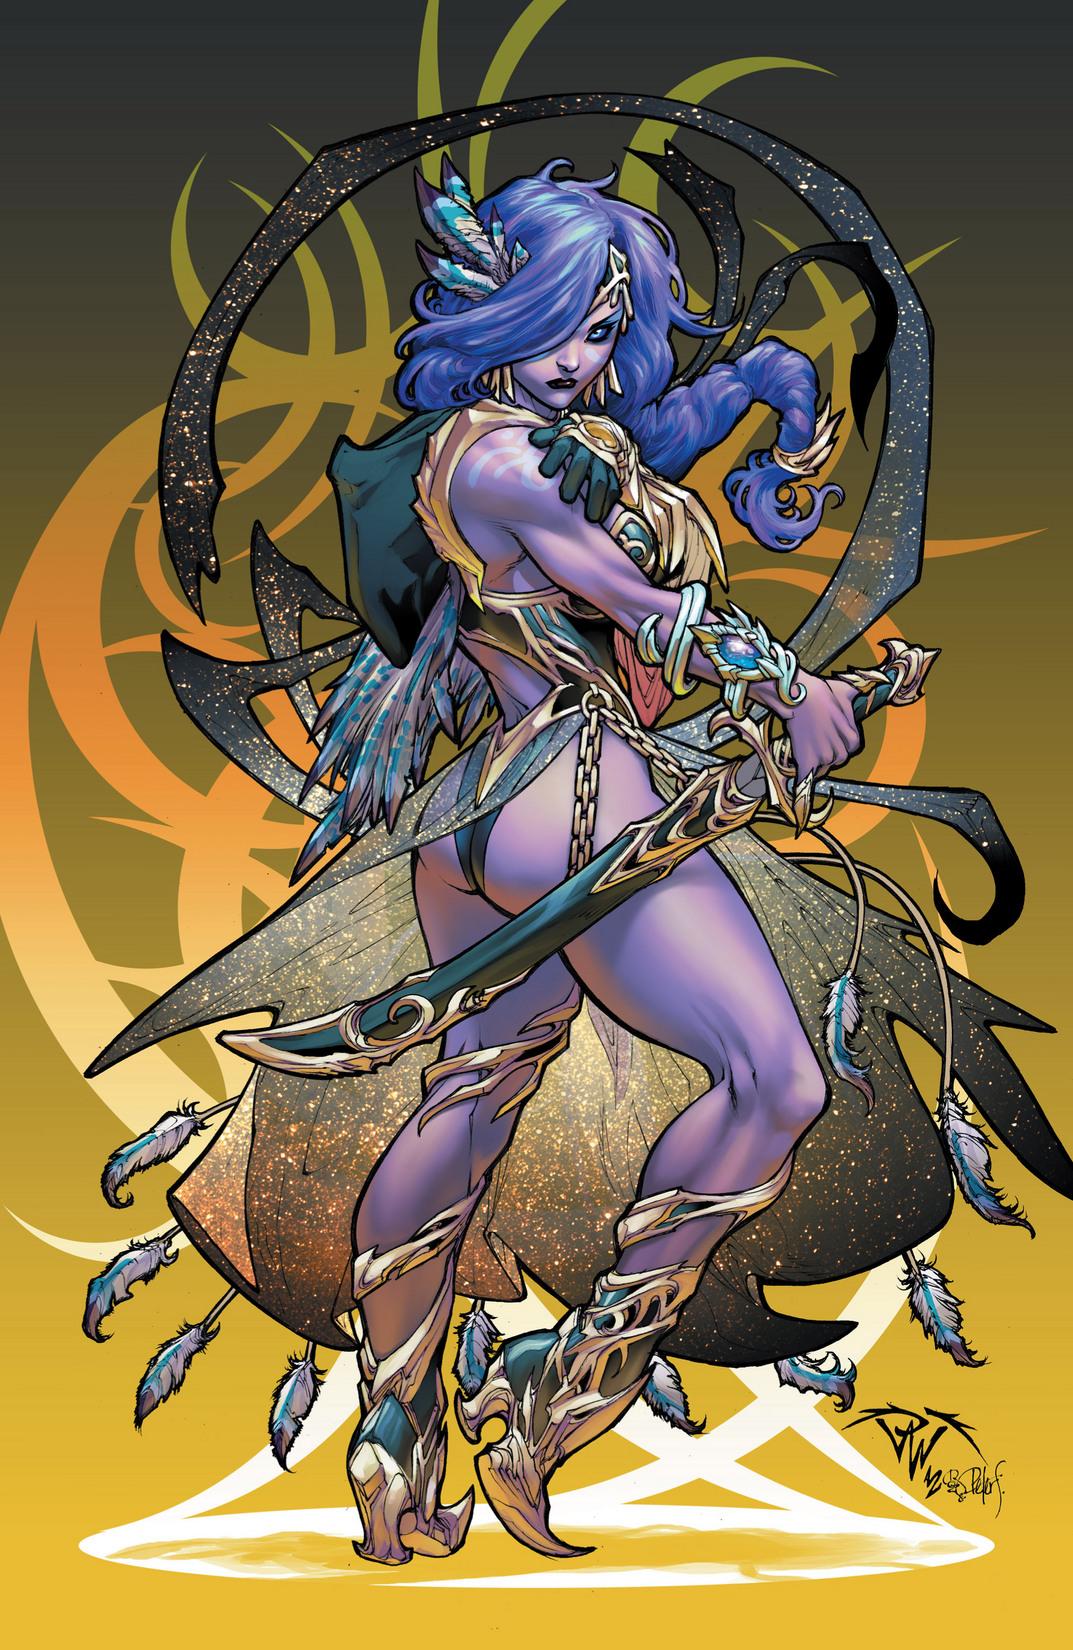 Read online Jirni comic -  Issue #1 - 2